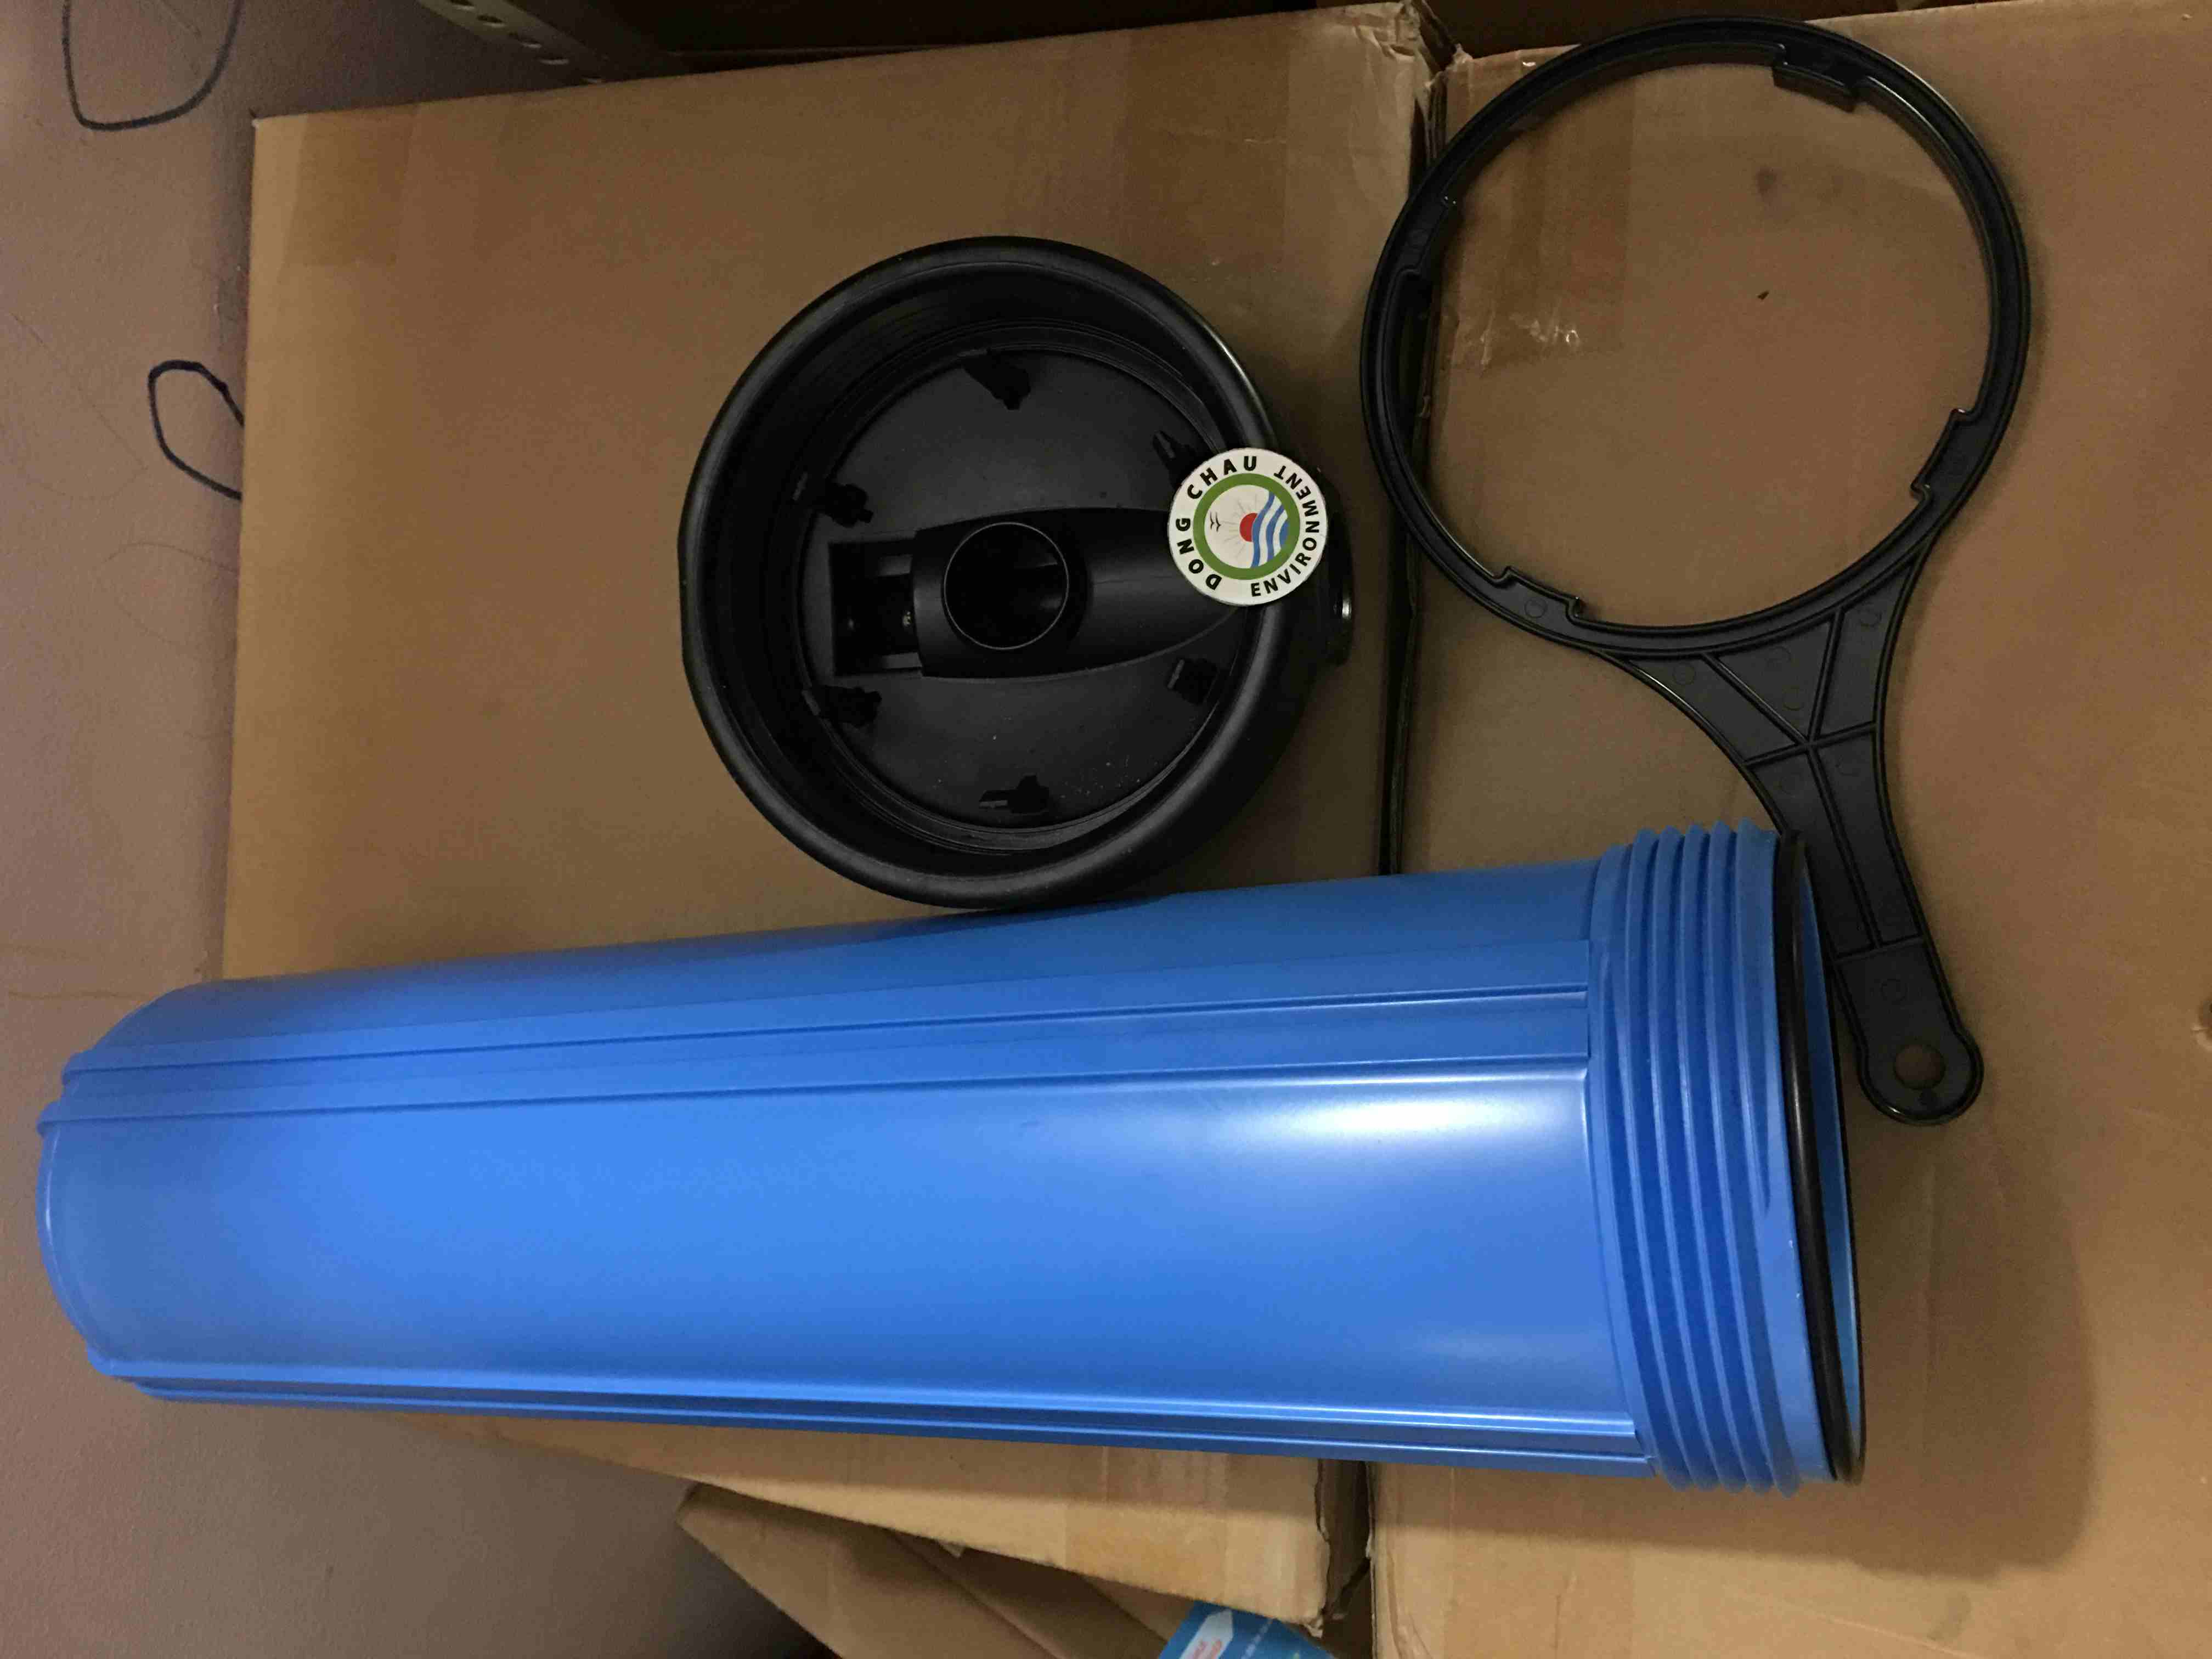 Cốc lọc nhựa xanh Biglu 20 inch